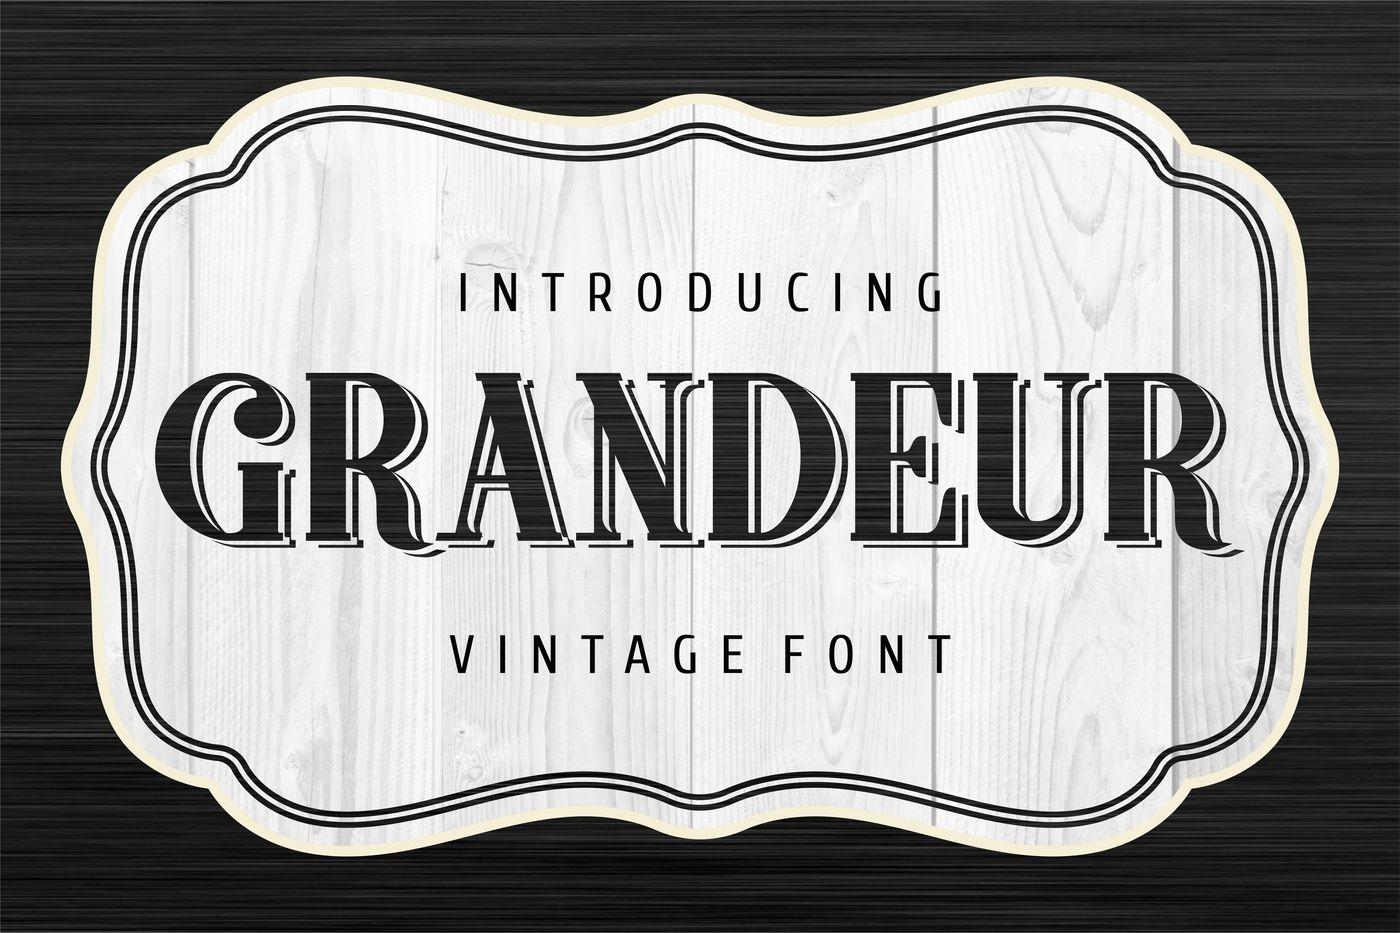 Grandeur New Vintage Font By Vintage Font Lab Thehungryjpeg Com